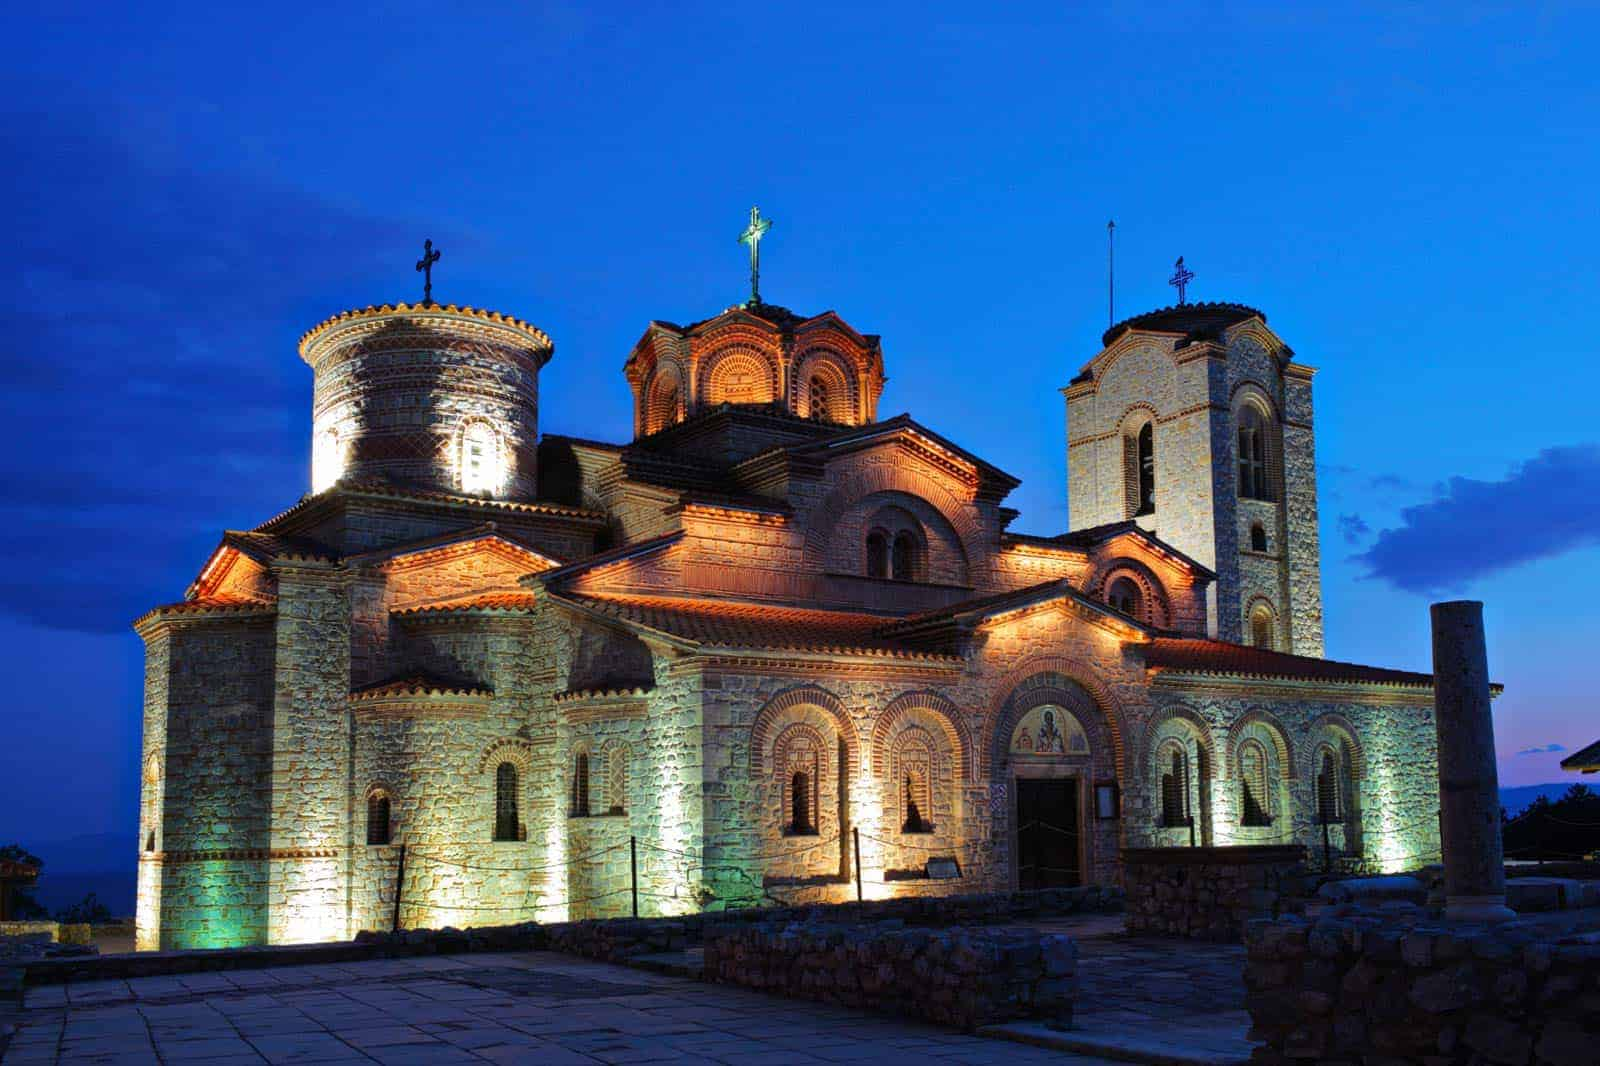 Bažnyčia prie Ohrido ežero, Makedonija